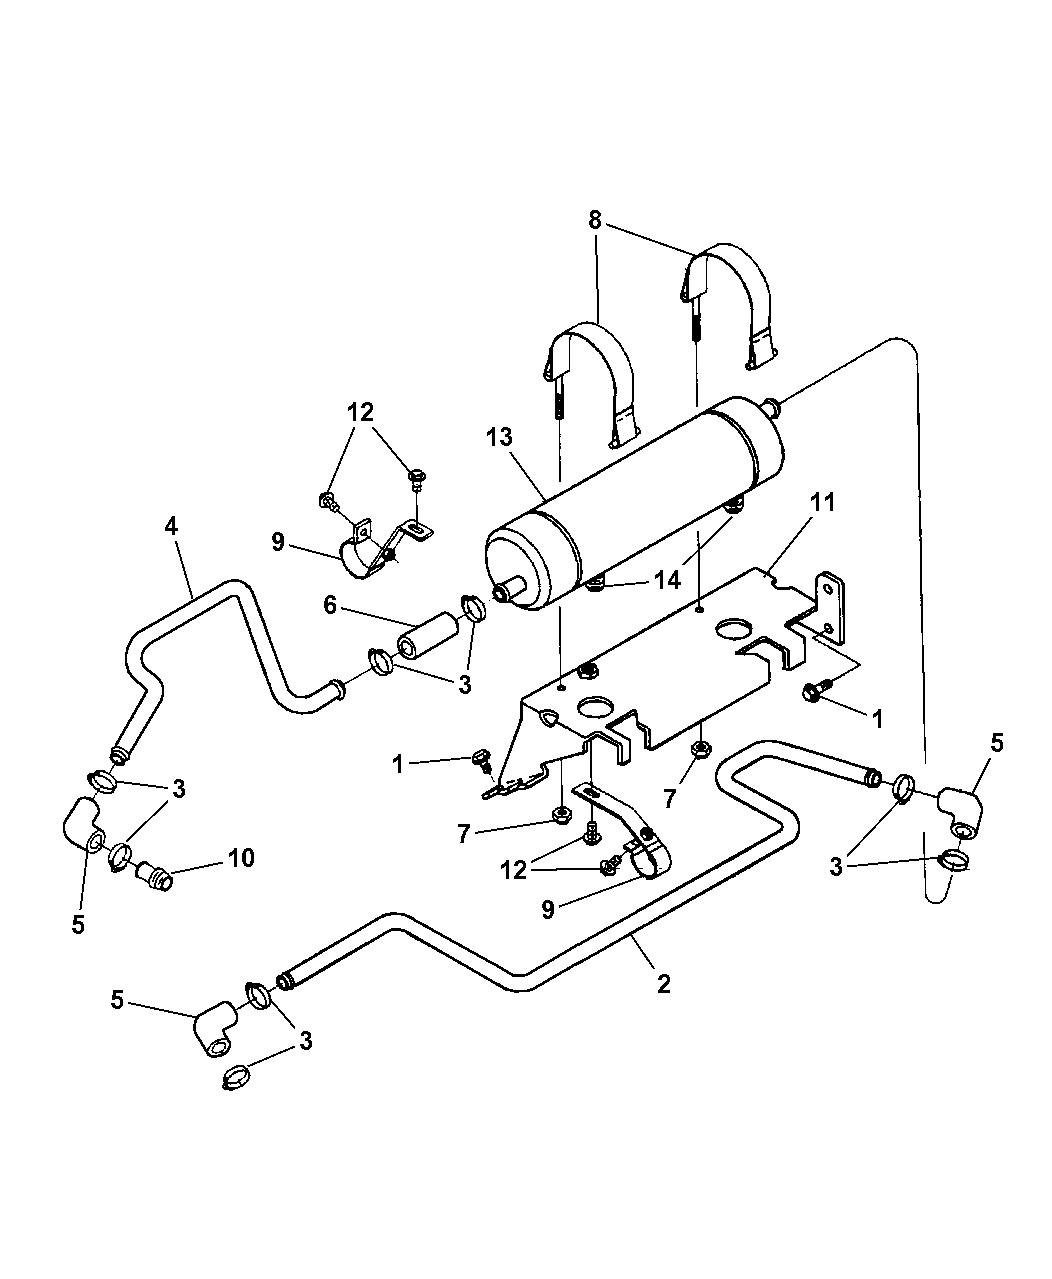 1997 dodge ram 1500 transmission